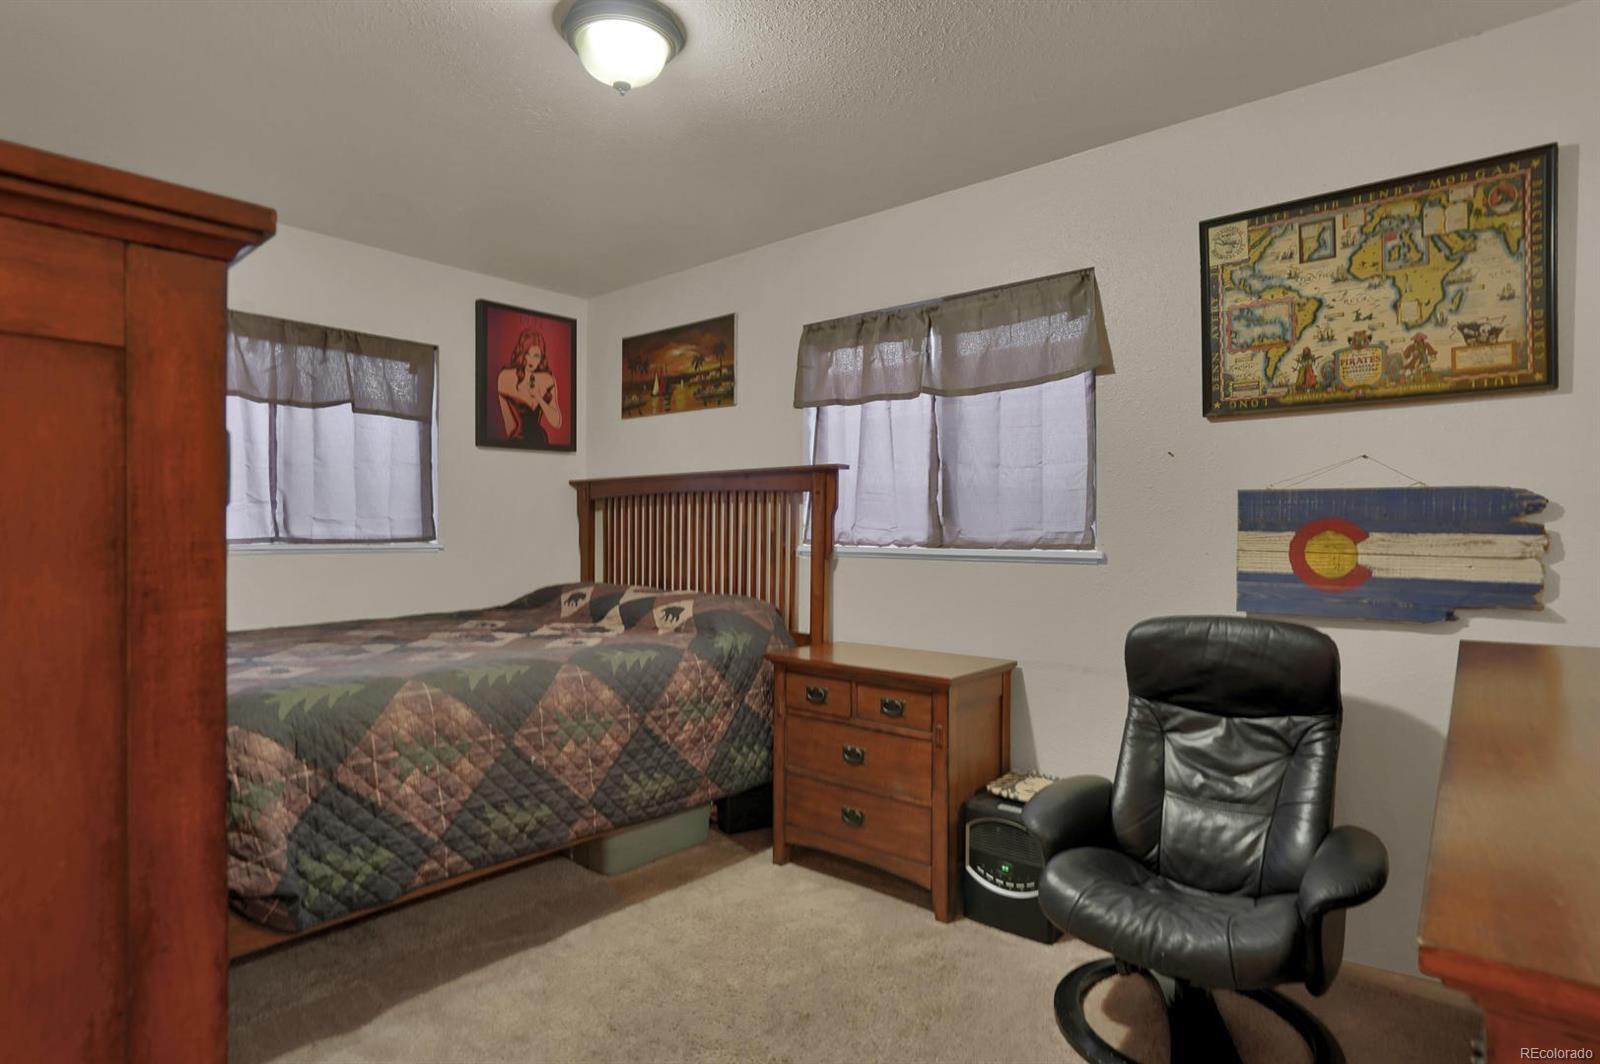 MLS# 6370085 - 1 - 2423  E St. Vrain Street, Colorado Springs, CO 80909